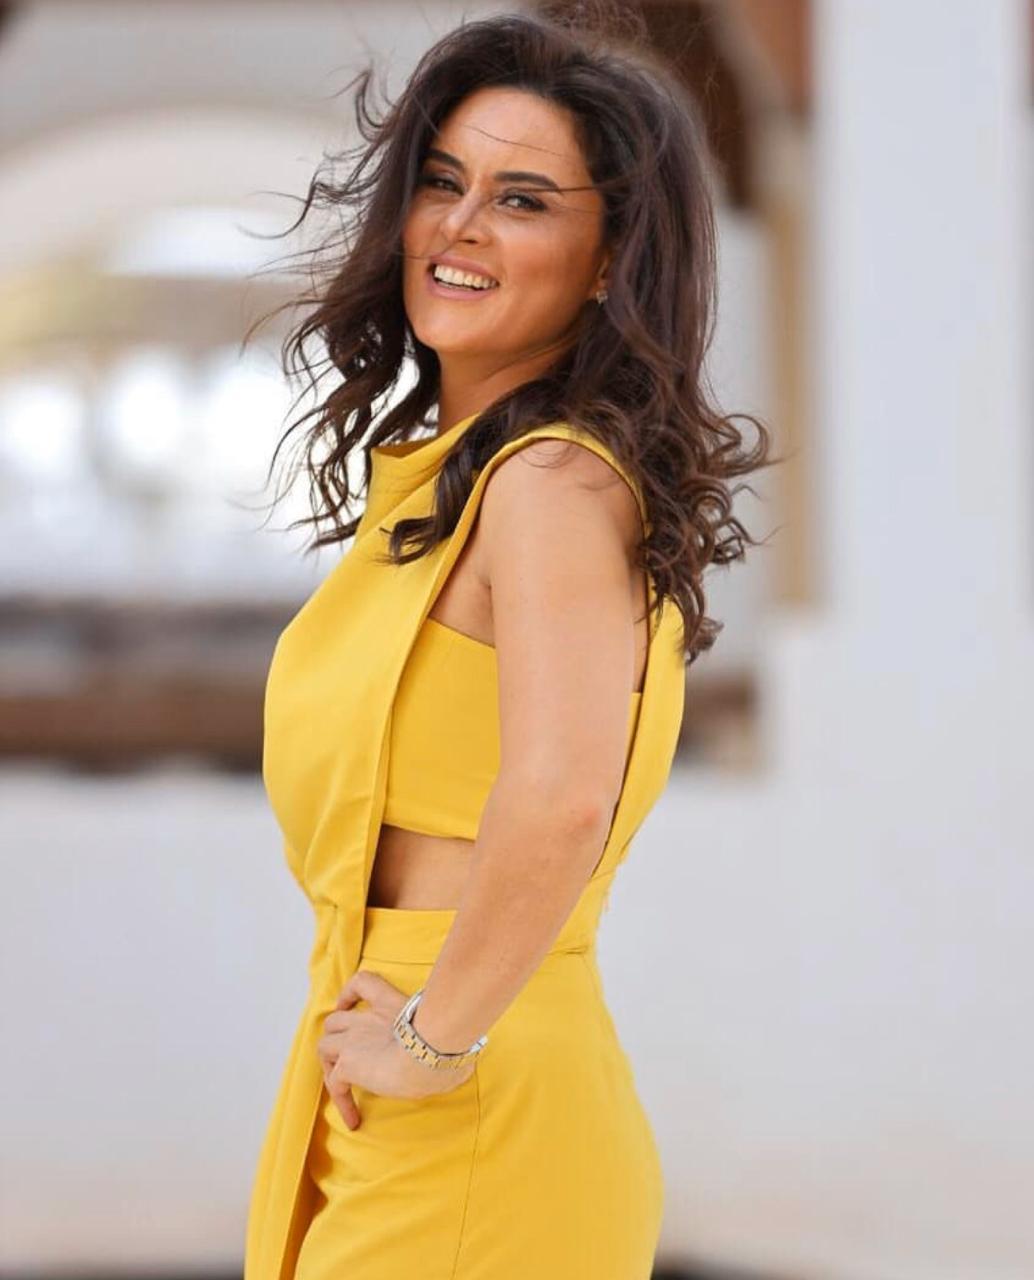 رشا مهدى (3)